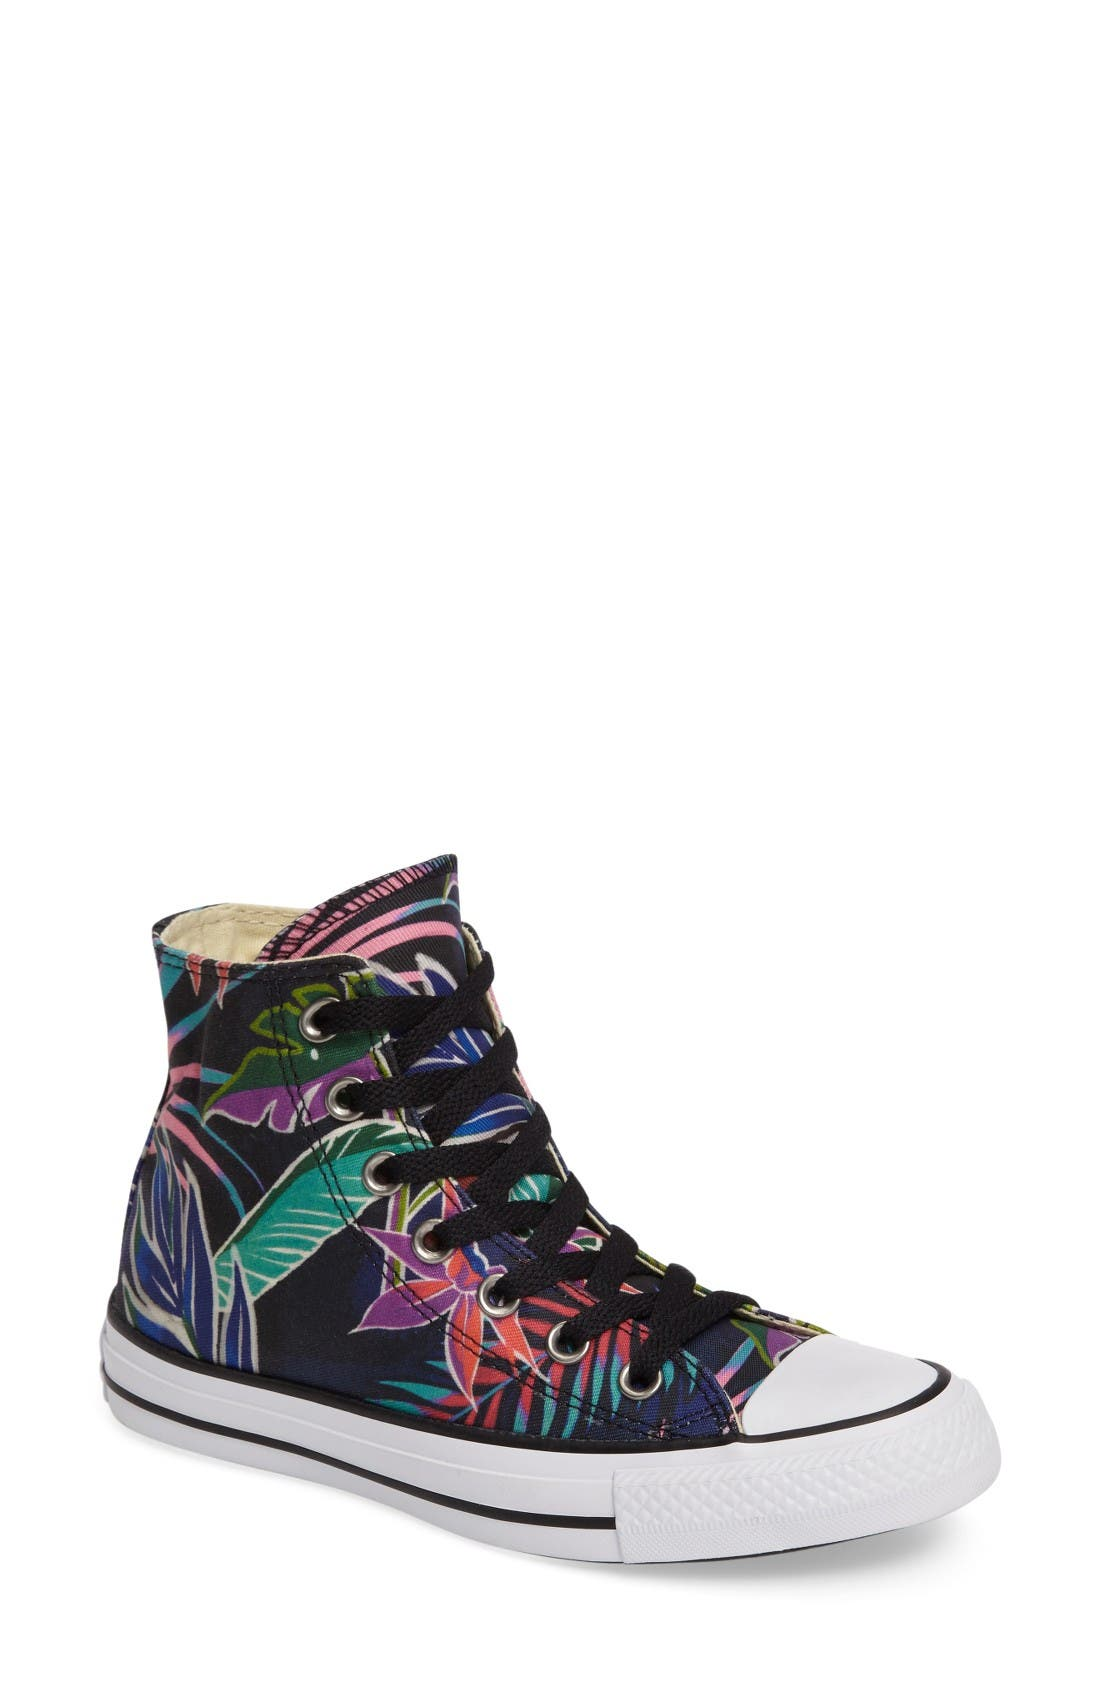 Main Image - Converse Chuck Taylor® All Star® Print High Top Sneaker (Women)